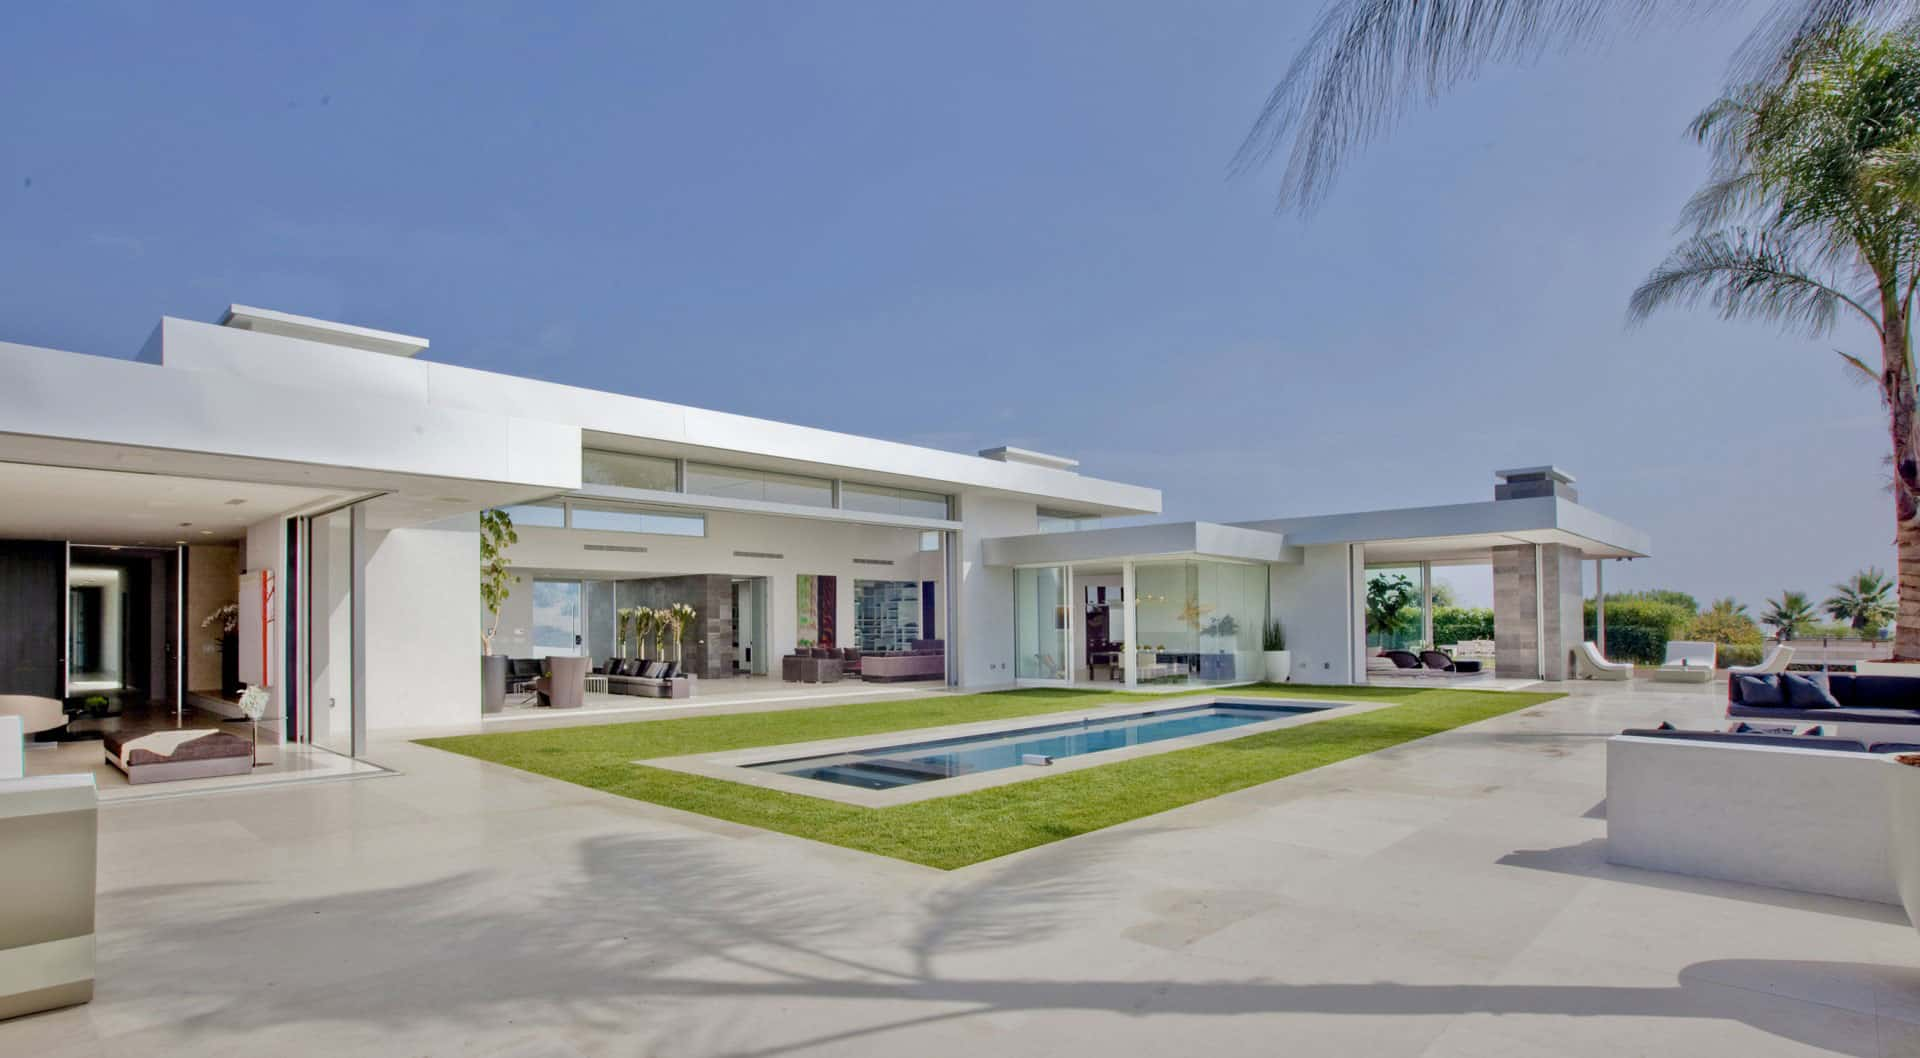 Home Design Usa Part - 44: Modern House Plans Usa - Rts - ^